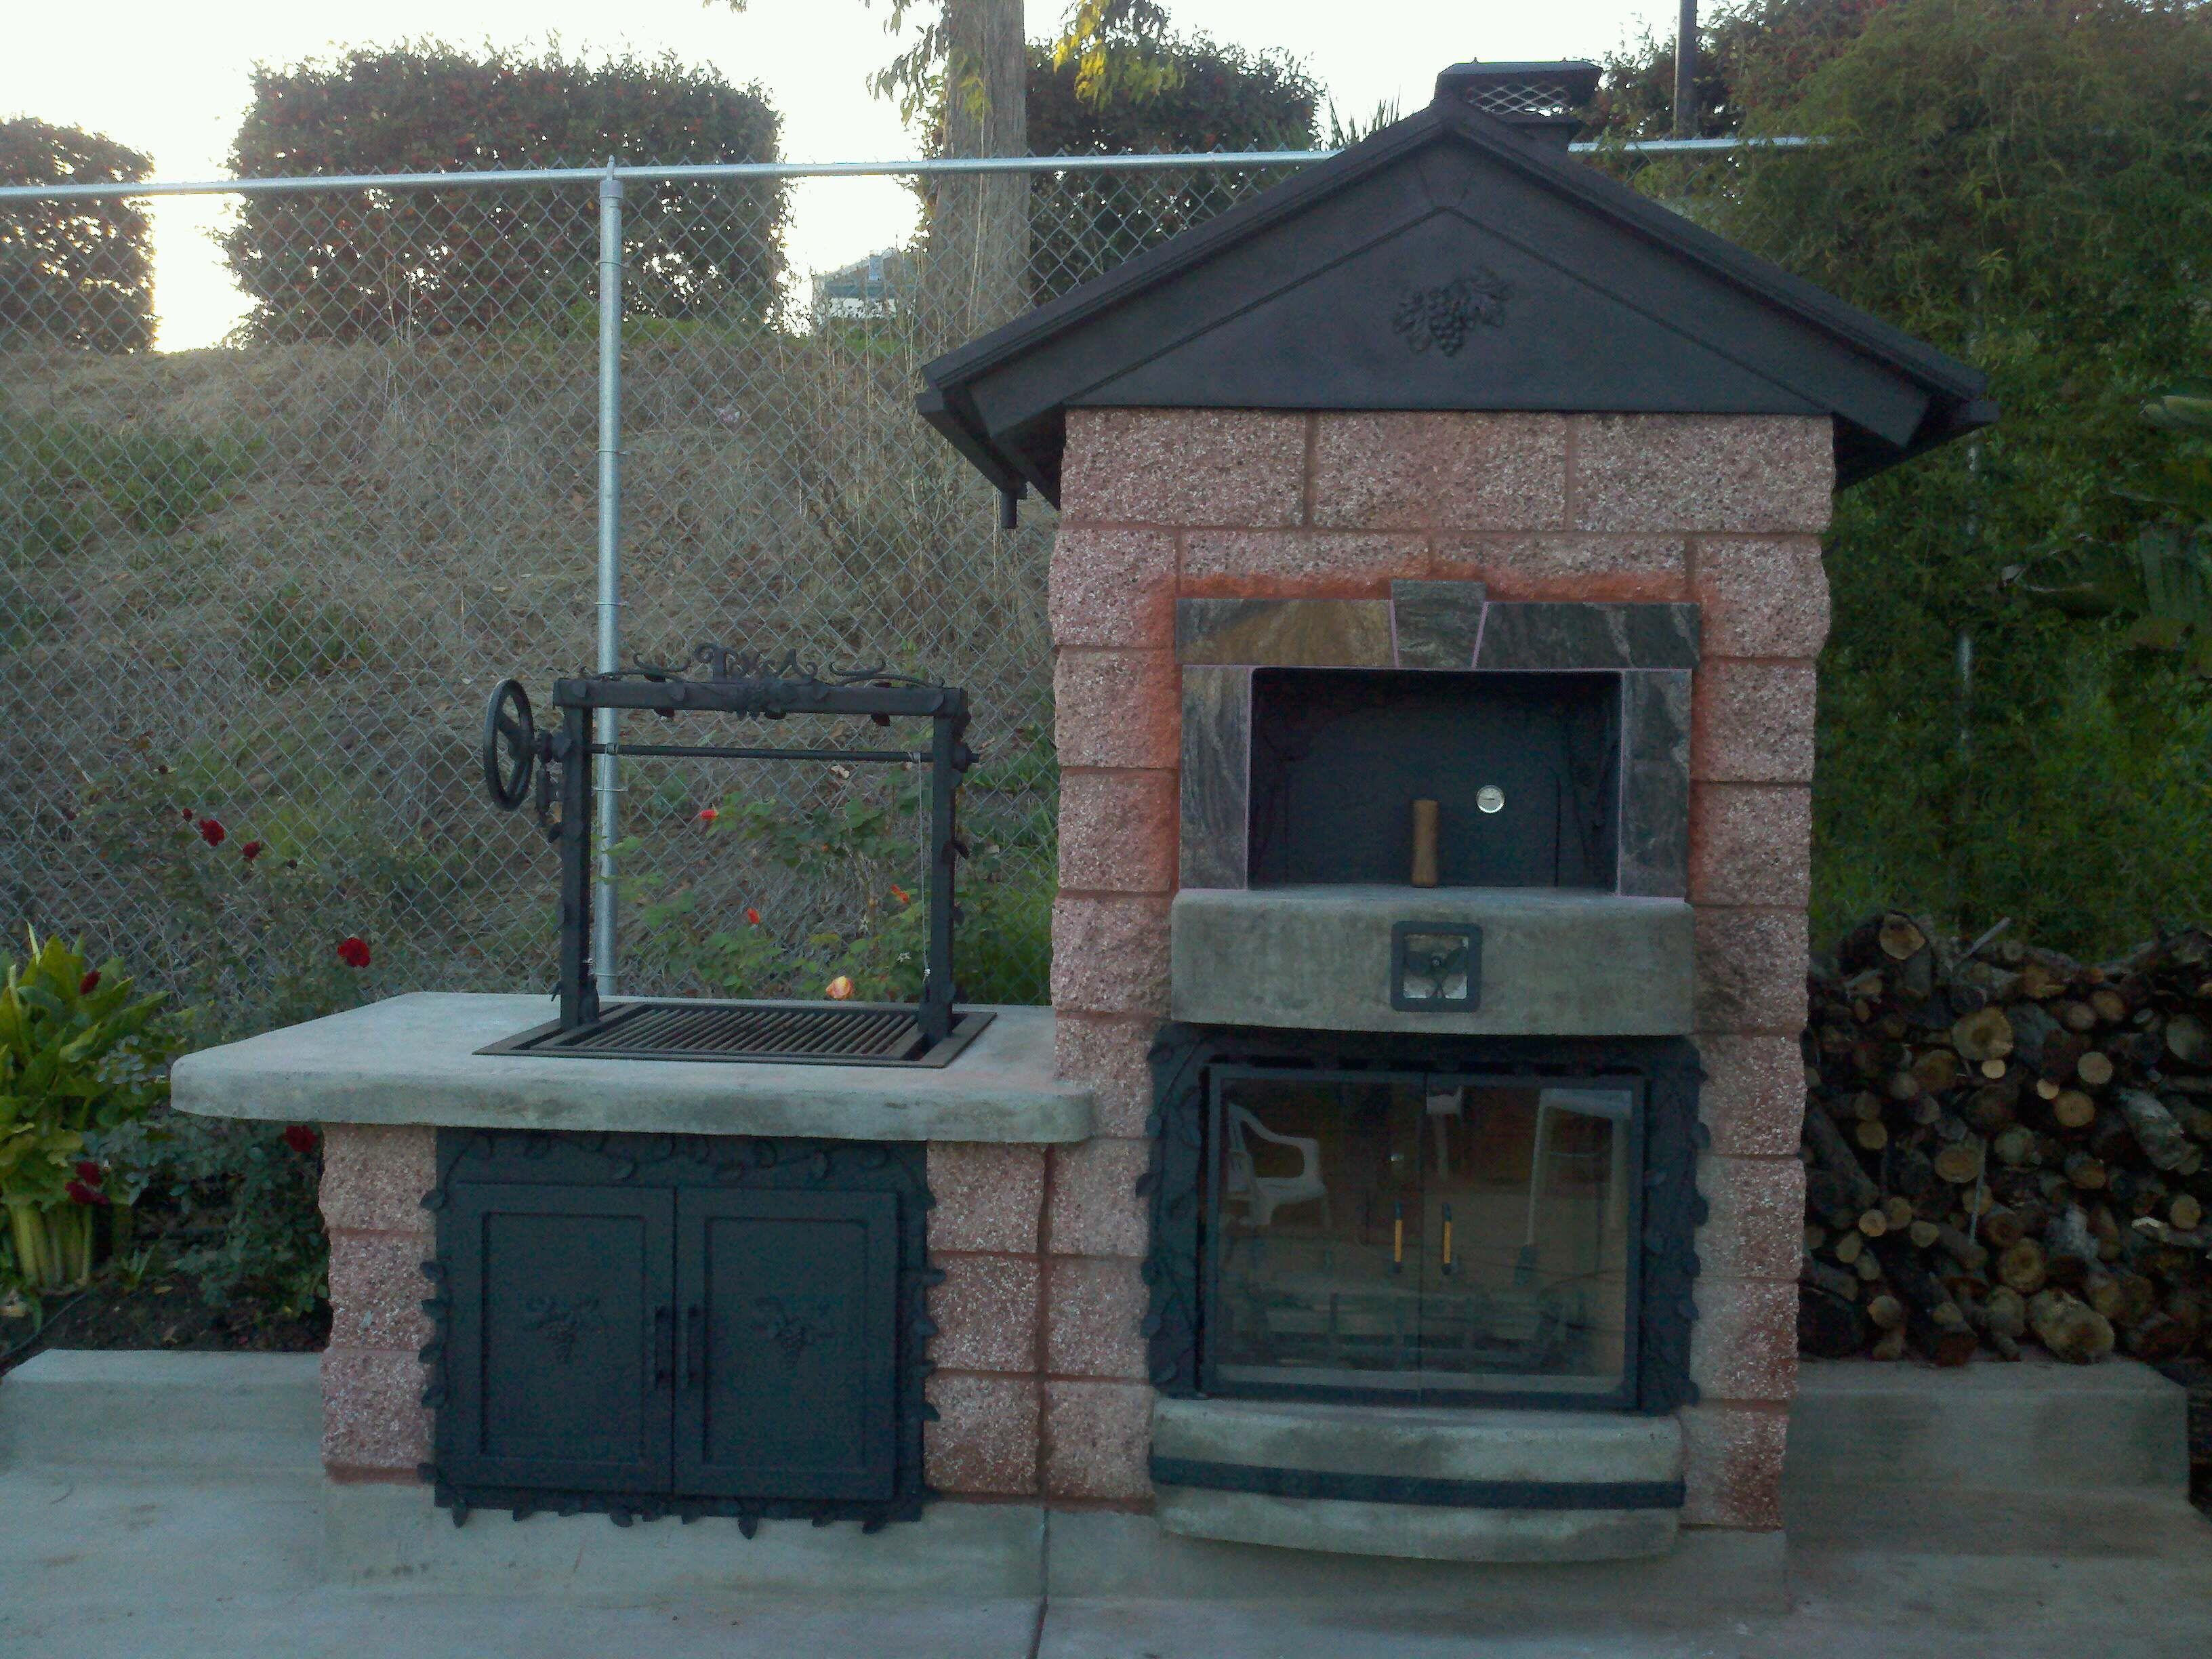 Outdoor Pizza Ovens Custom Outdoor Kitchen Lc Oven Designs Pizza Oven Outdoor Grill Area Outdoor Bbq Pizza Oven Outdoor